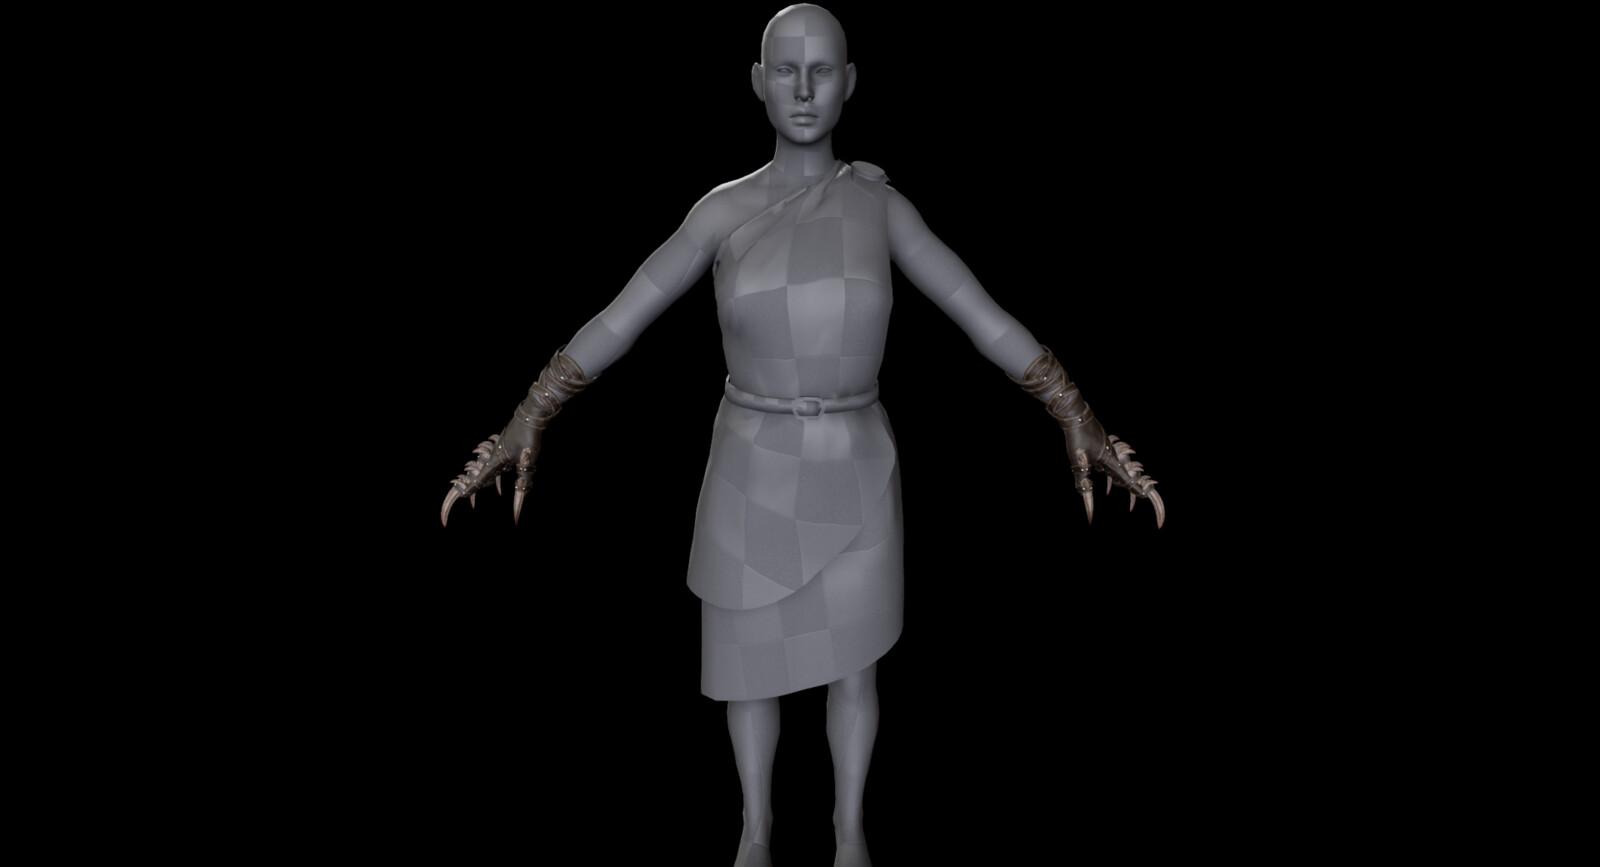 Female version